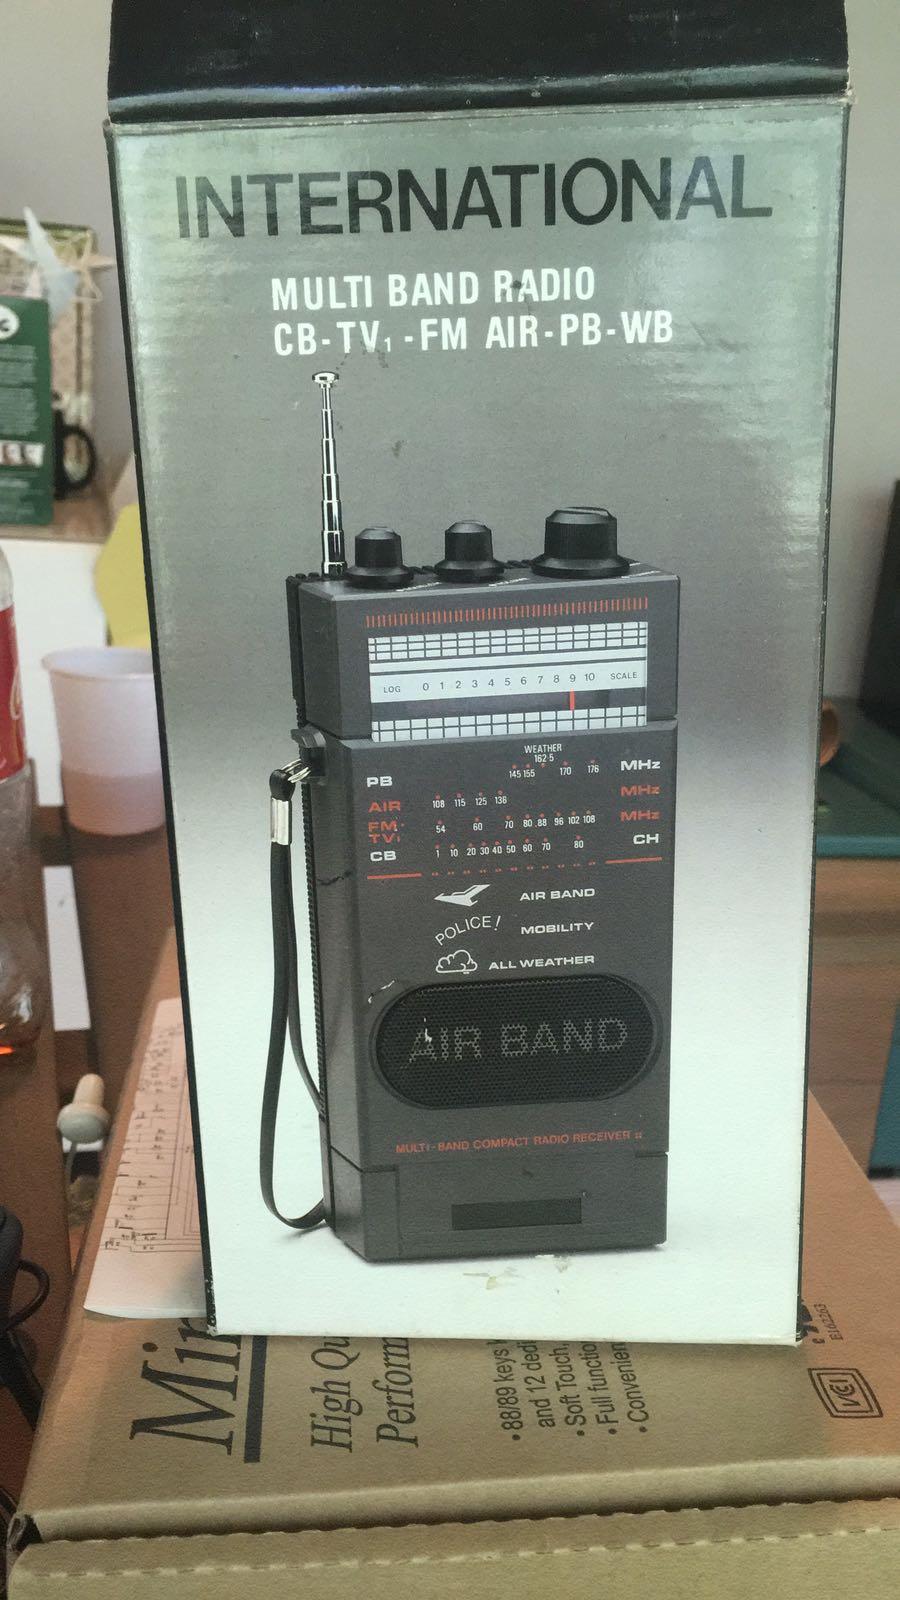 Schemi Elettrici Radio Cb : Ricevitore multibanda cb vhf low air band